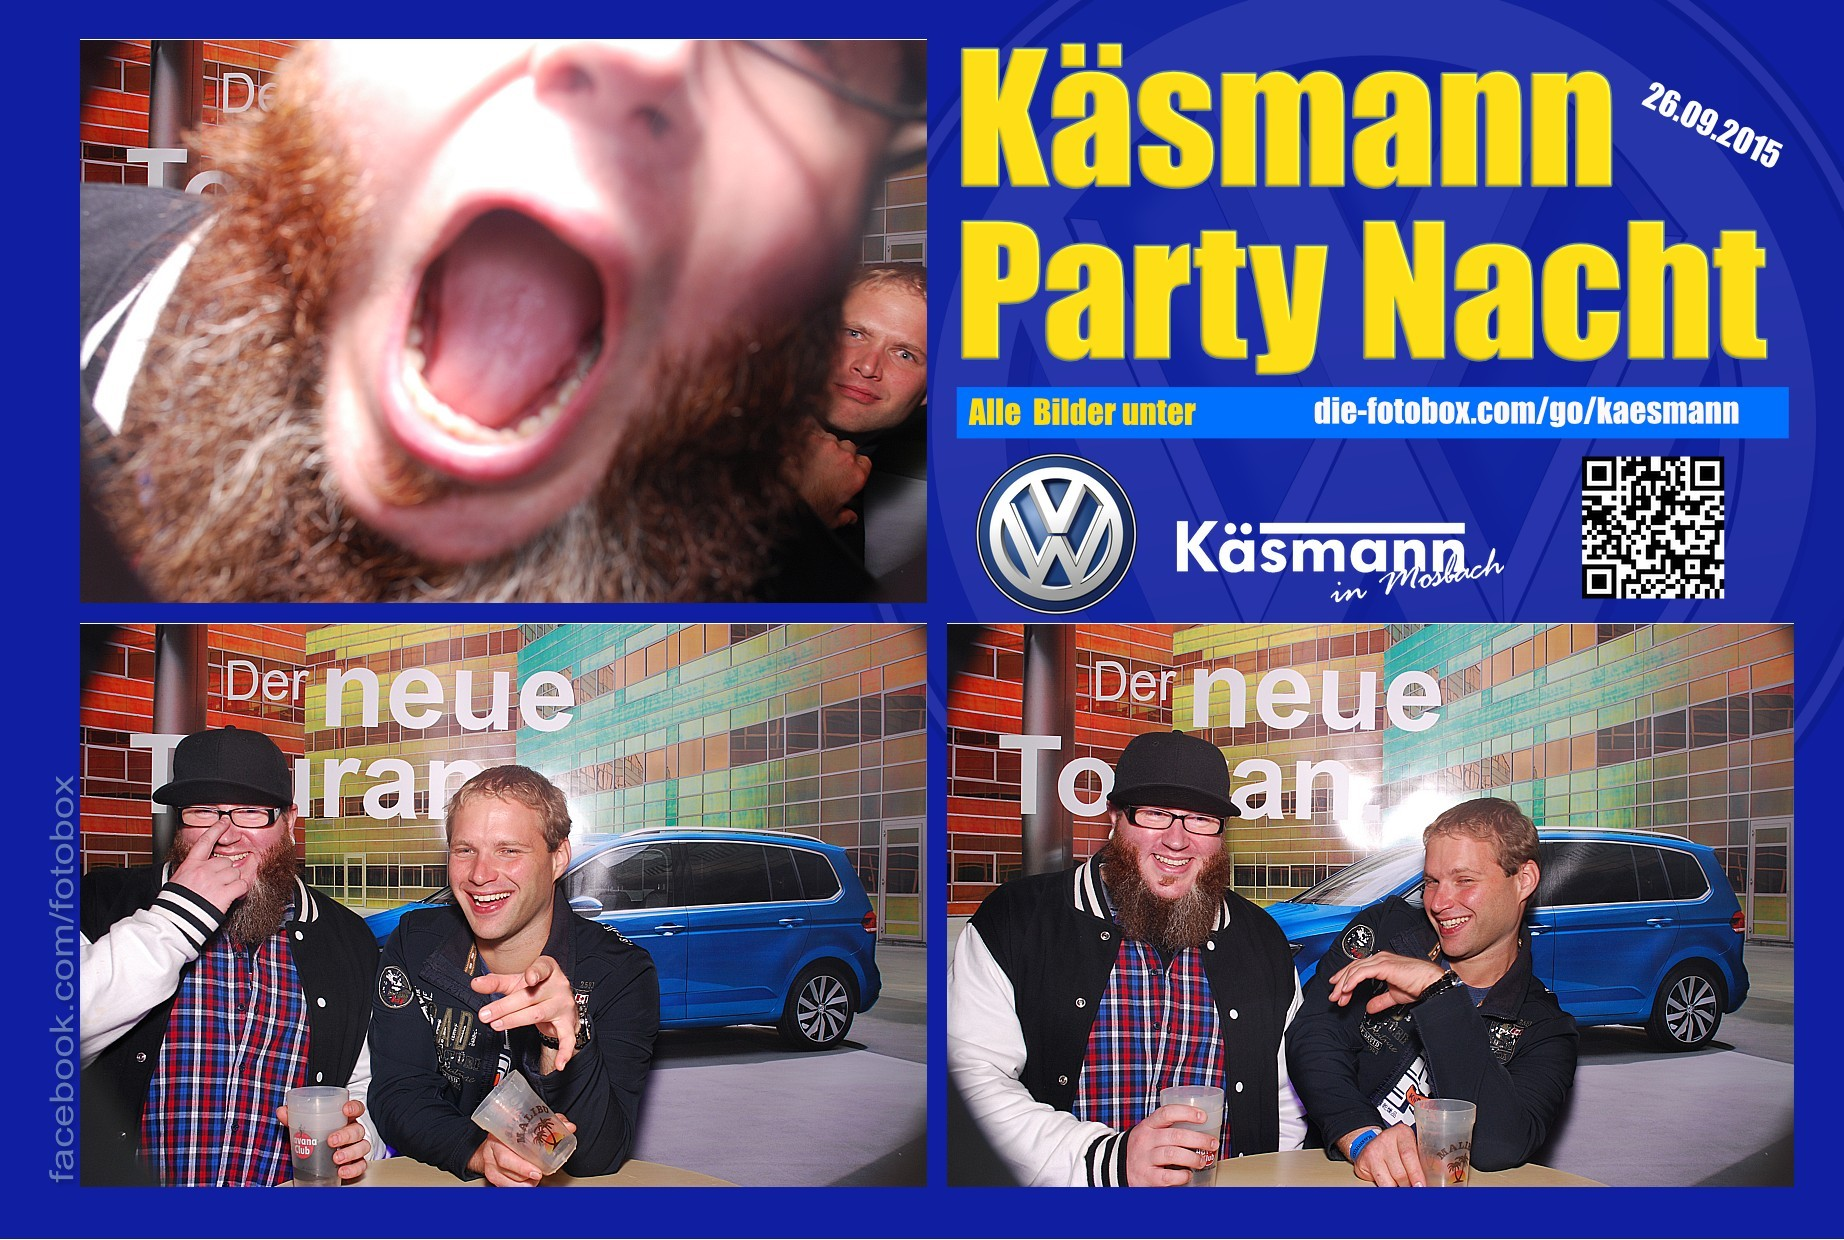 Käsmannparty 2015 - www.die-fotobox.com 01228